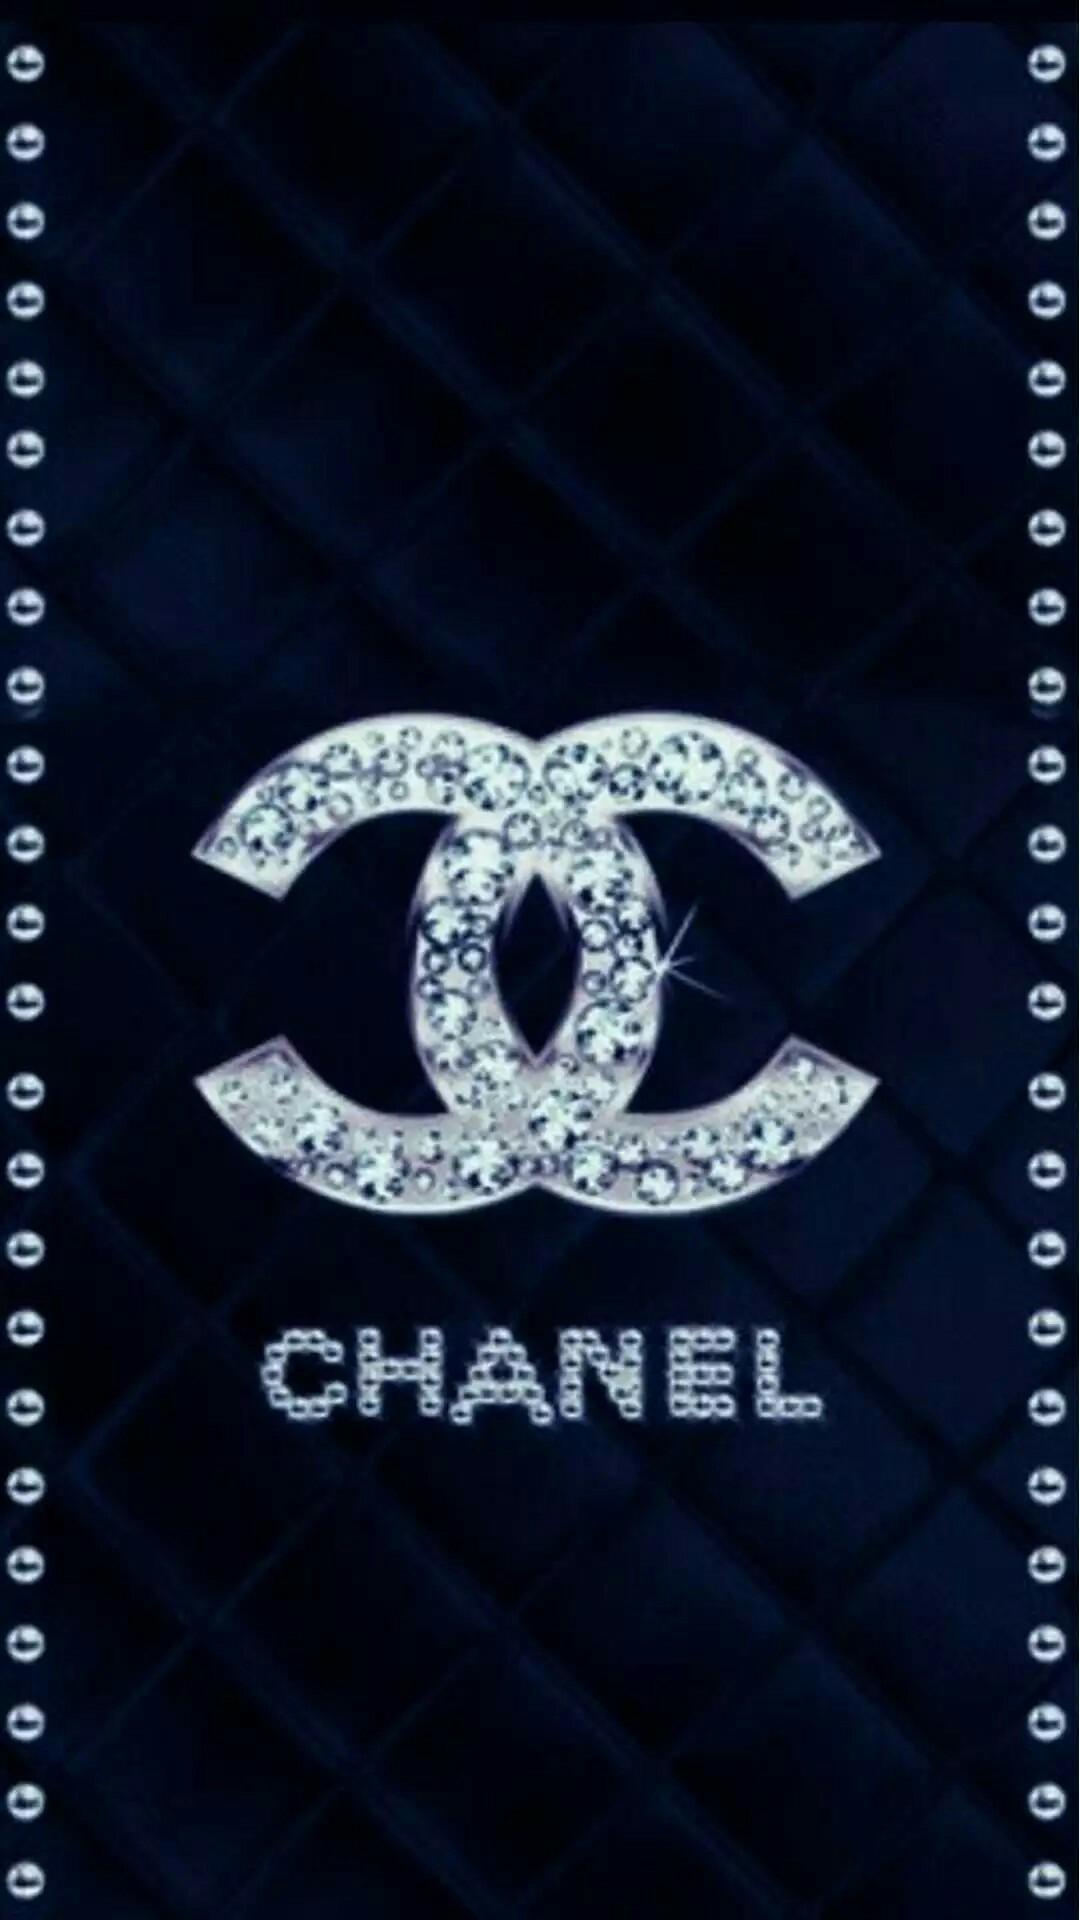 Coco Chanel Tumblr Backgrounds | www.pixshark.com - Images ...